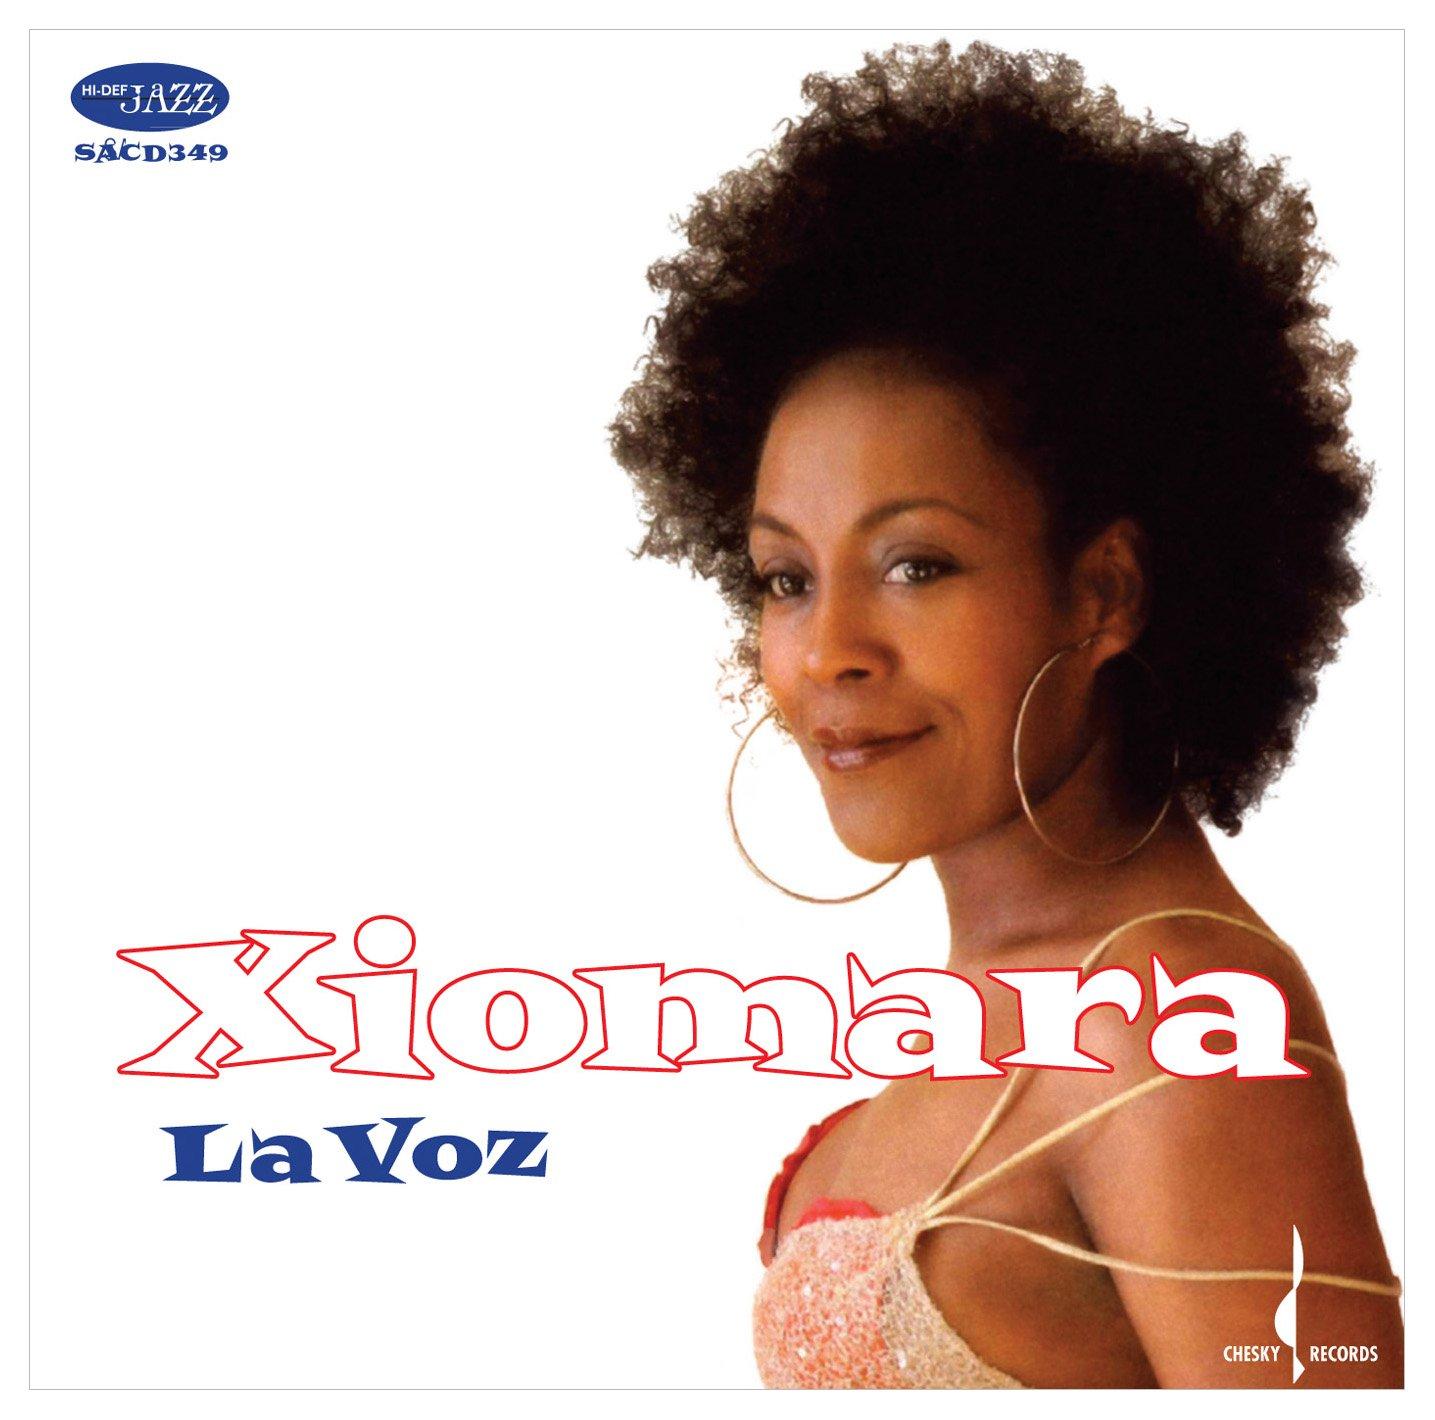 Xiomara Laugart Xiomara Laugart La Voz Amazoncom Music